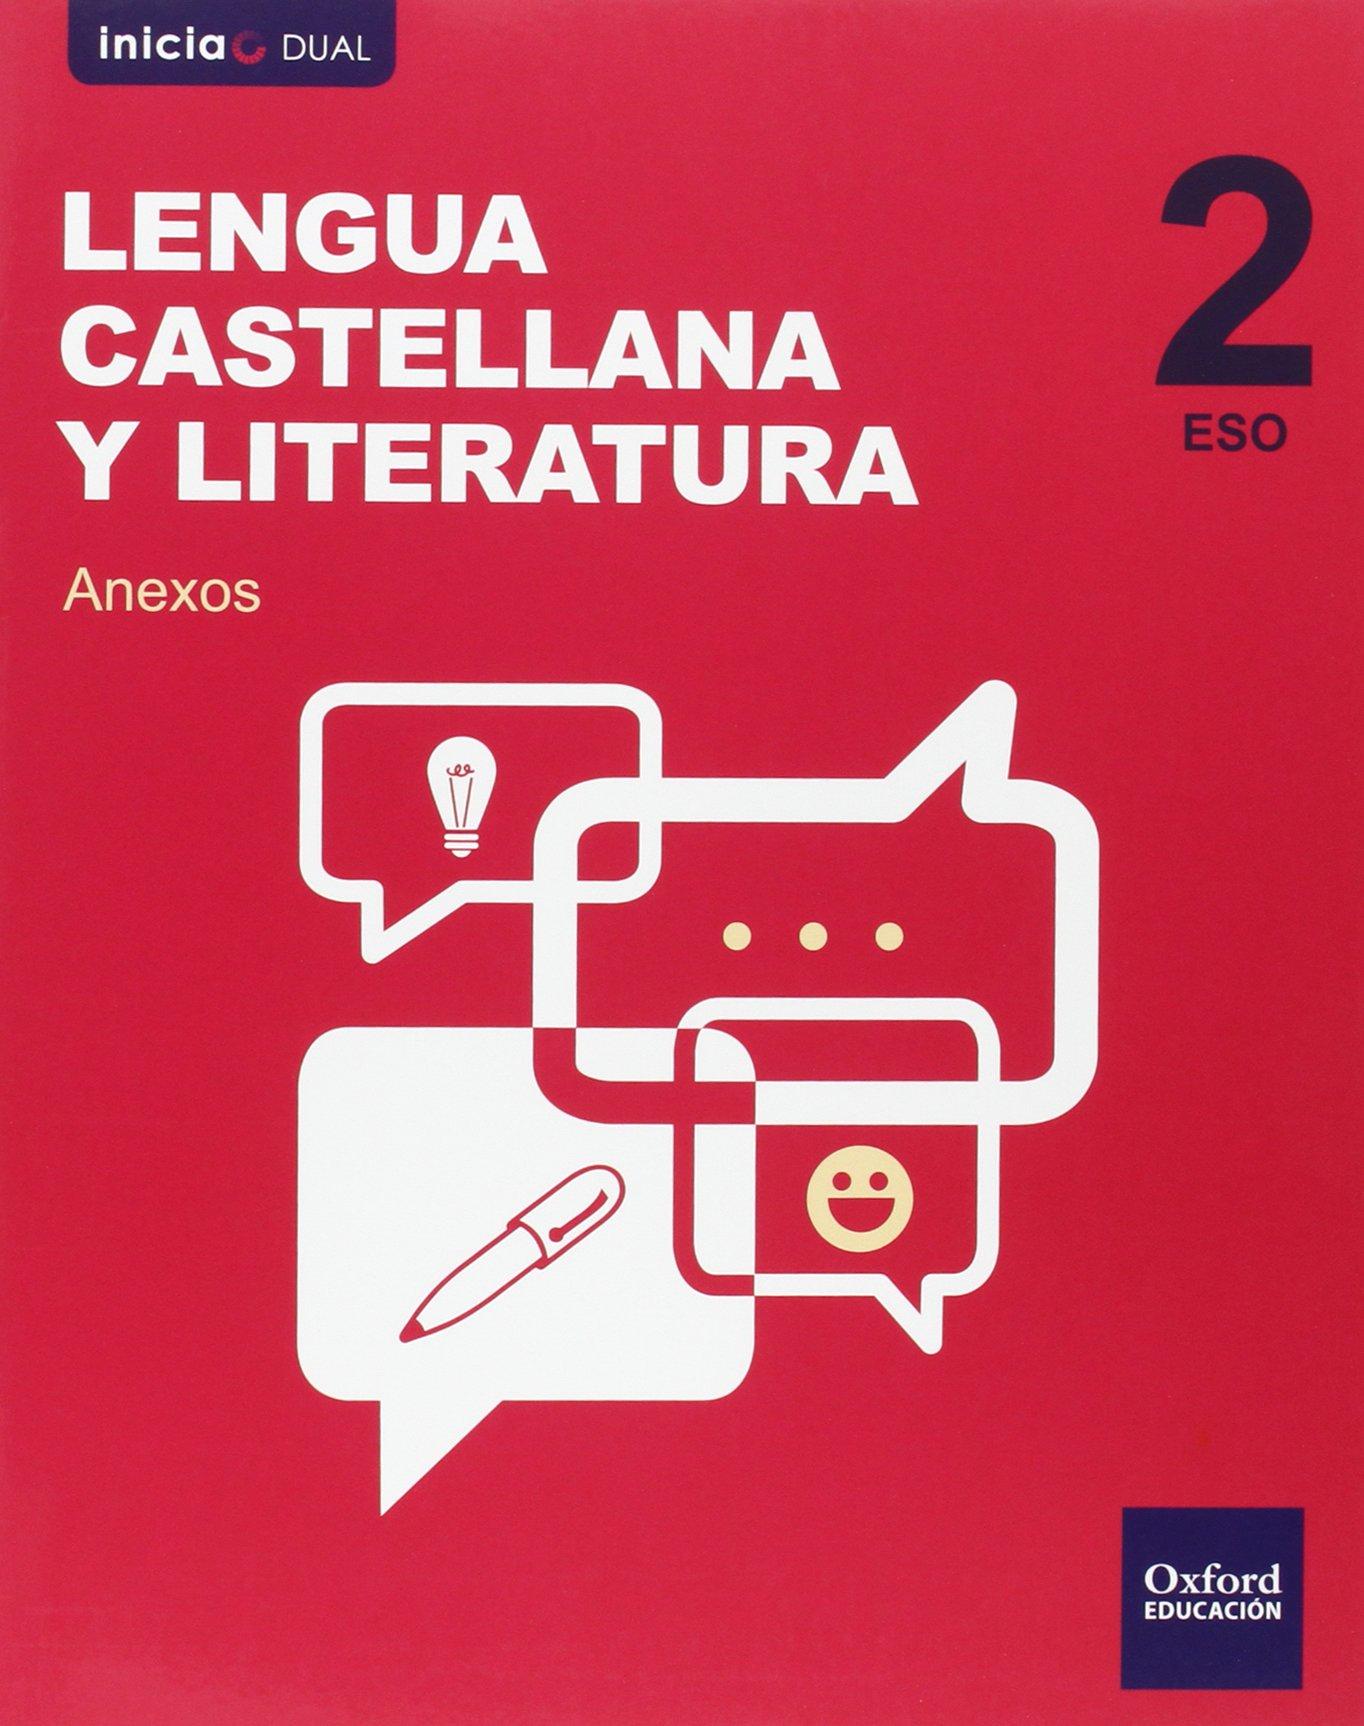 Pack Inicia Dual Lengua Castellana Y Literatura. Volúmenes Trimestrales.  Libro Del Alumno - 2º ESO - 9780190502829: Amazon.es: José Manuel González  Bernal, ...